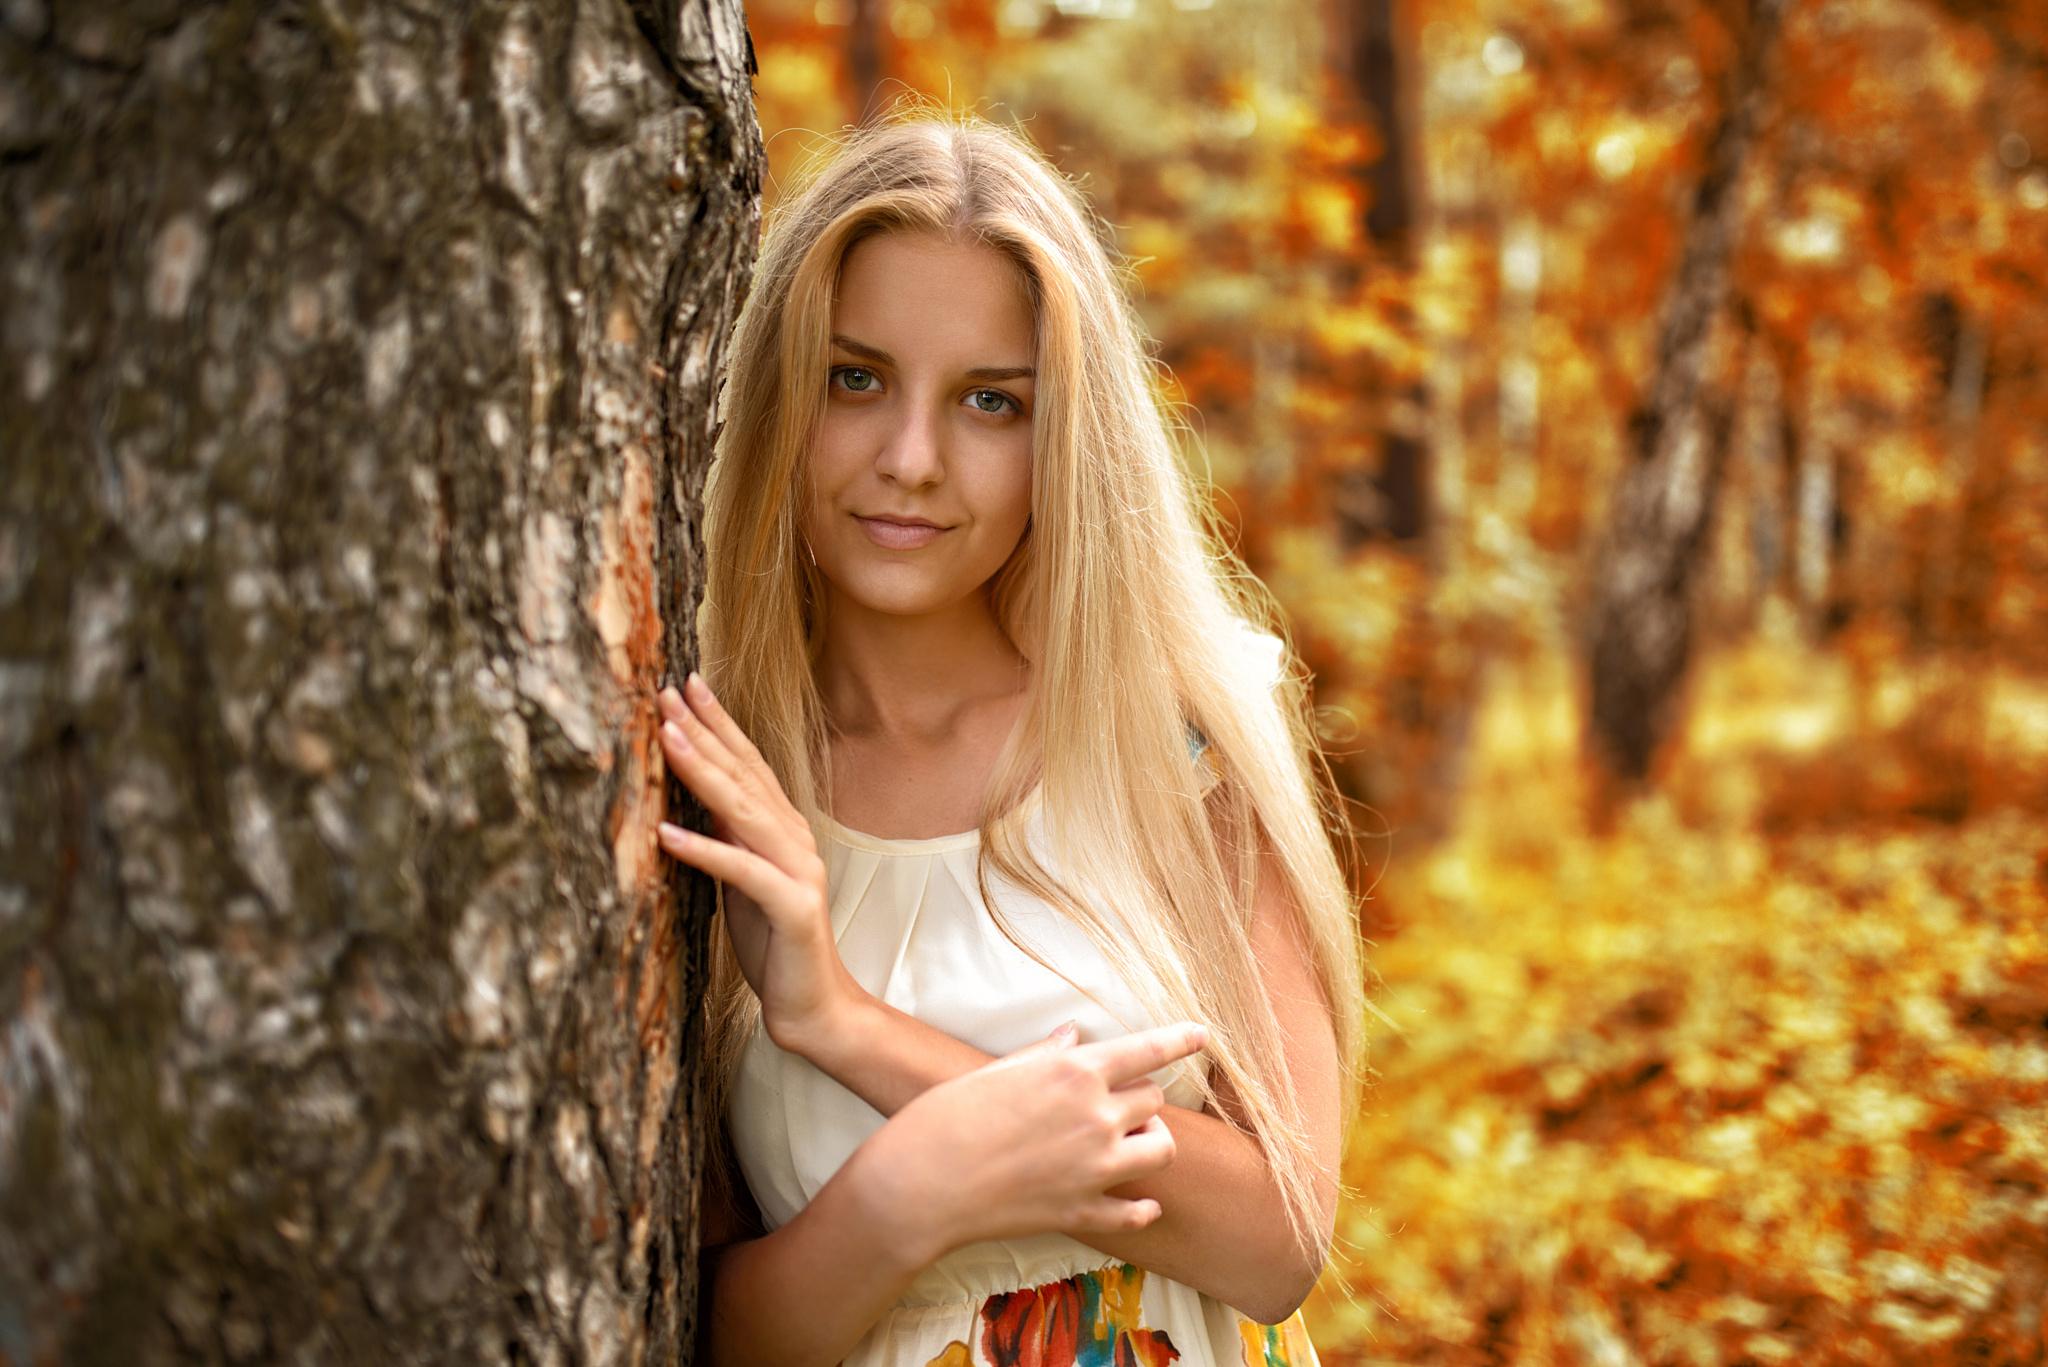 foto-krasivih-devushek-litso-blondinka-pod-derevom-russkoe-porno-mezhdu-suprugami